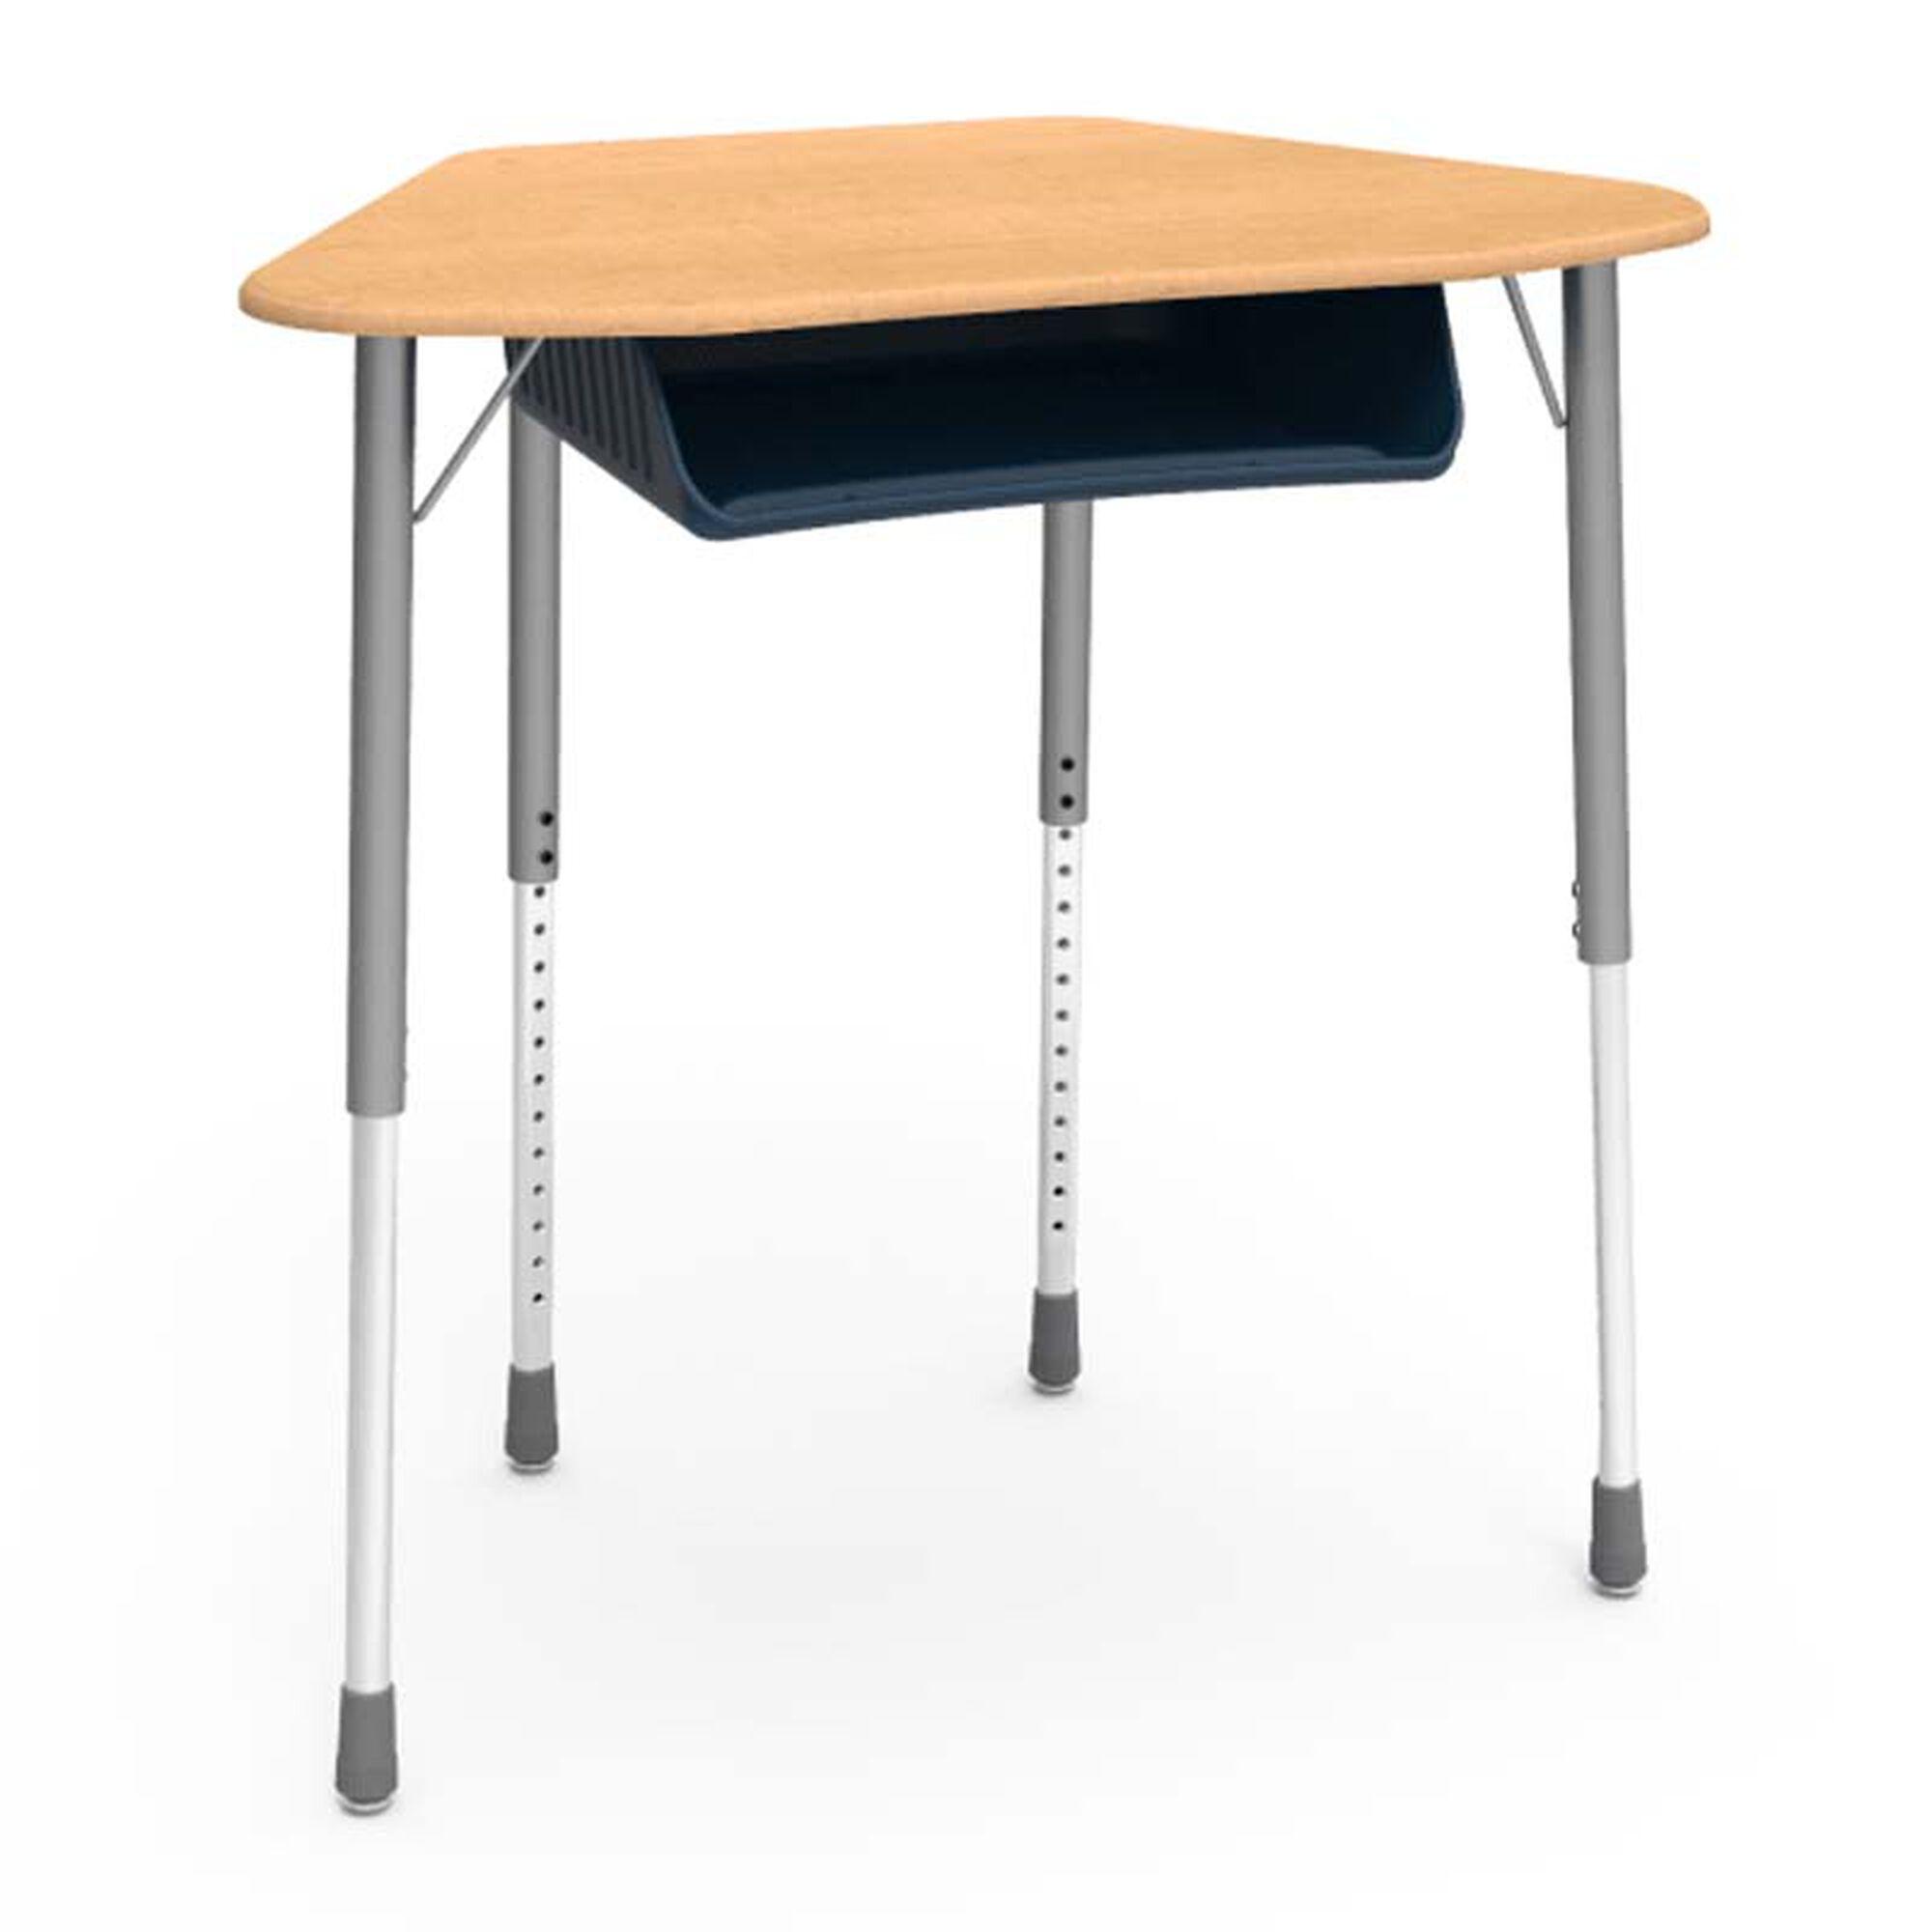 Zuma Adjustable Student Desk 4048247 Schoolfurniture4less Com